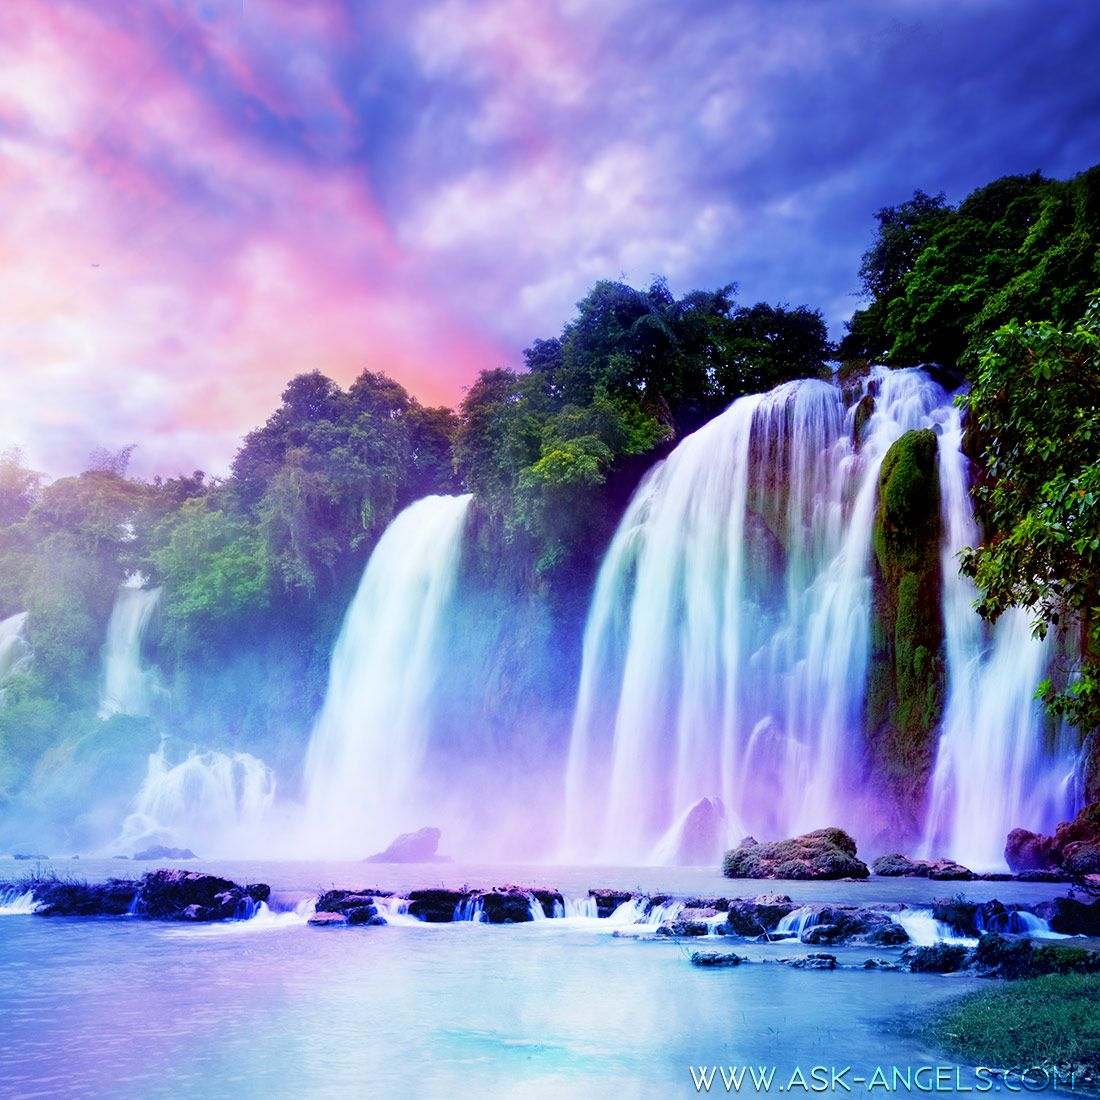 The Waterfall Of Light Meditation Waterfall Waterfall Wallpaper Nature Sounds